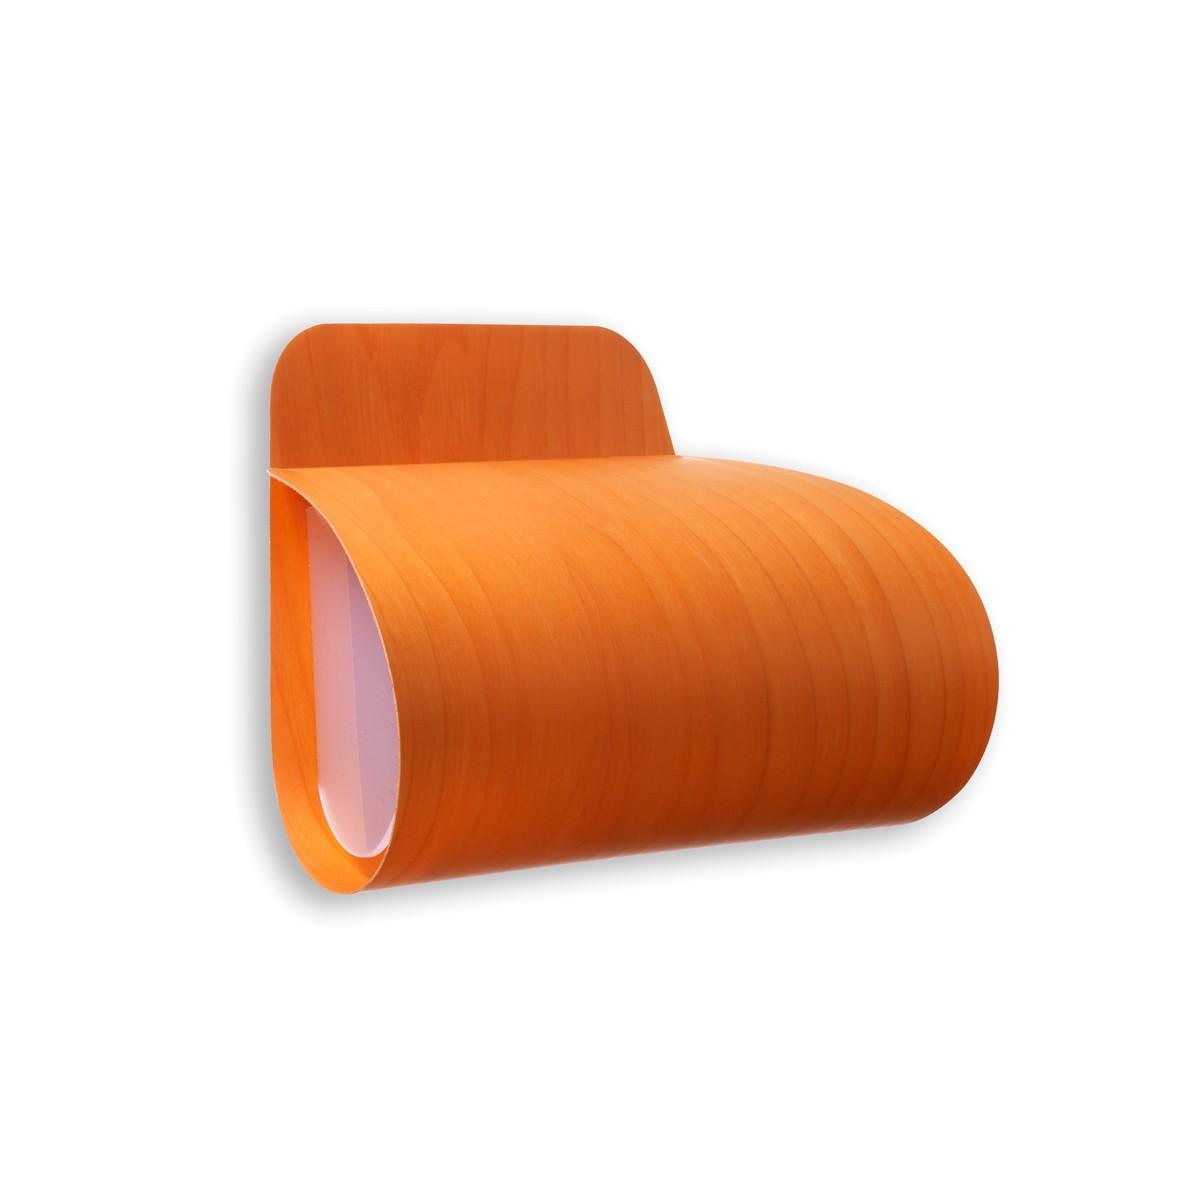 LZF Lamps Pleg LED Wandleuchte, orange